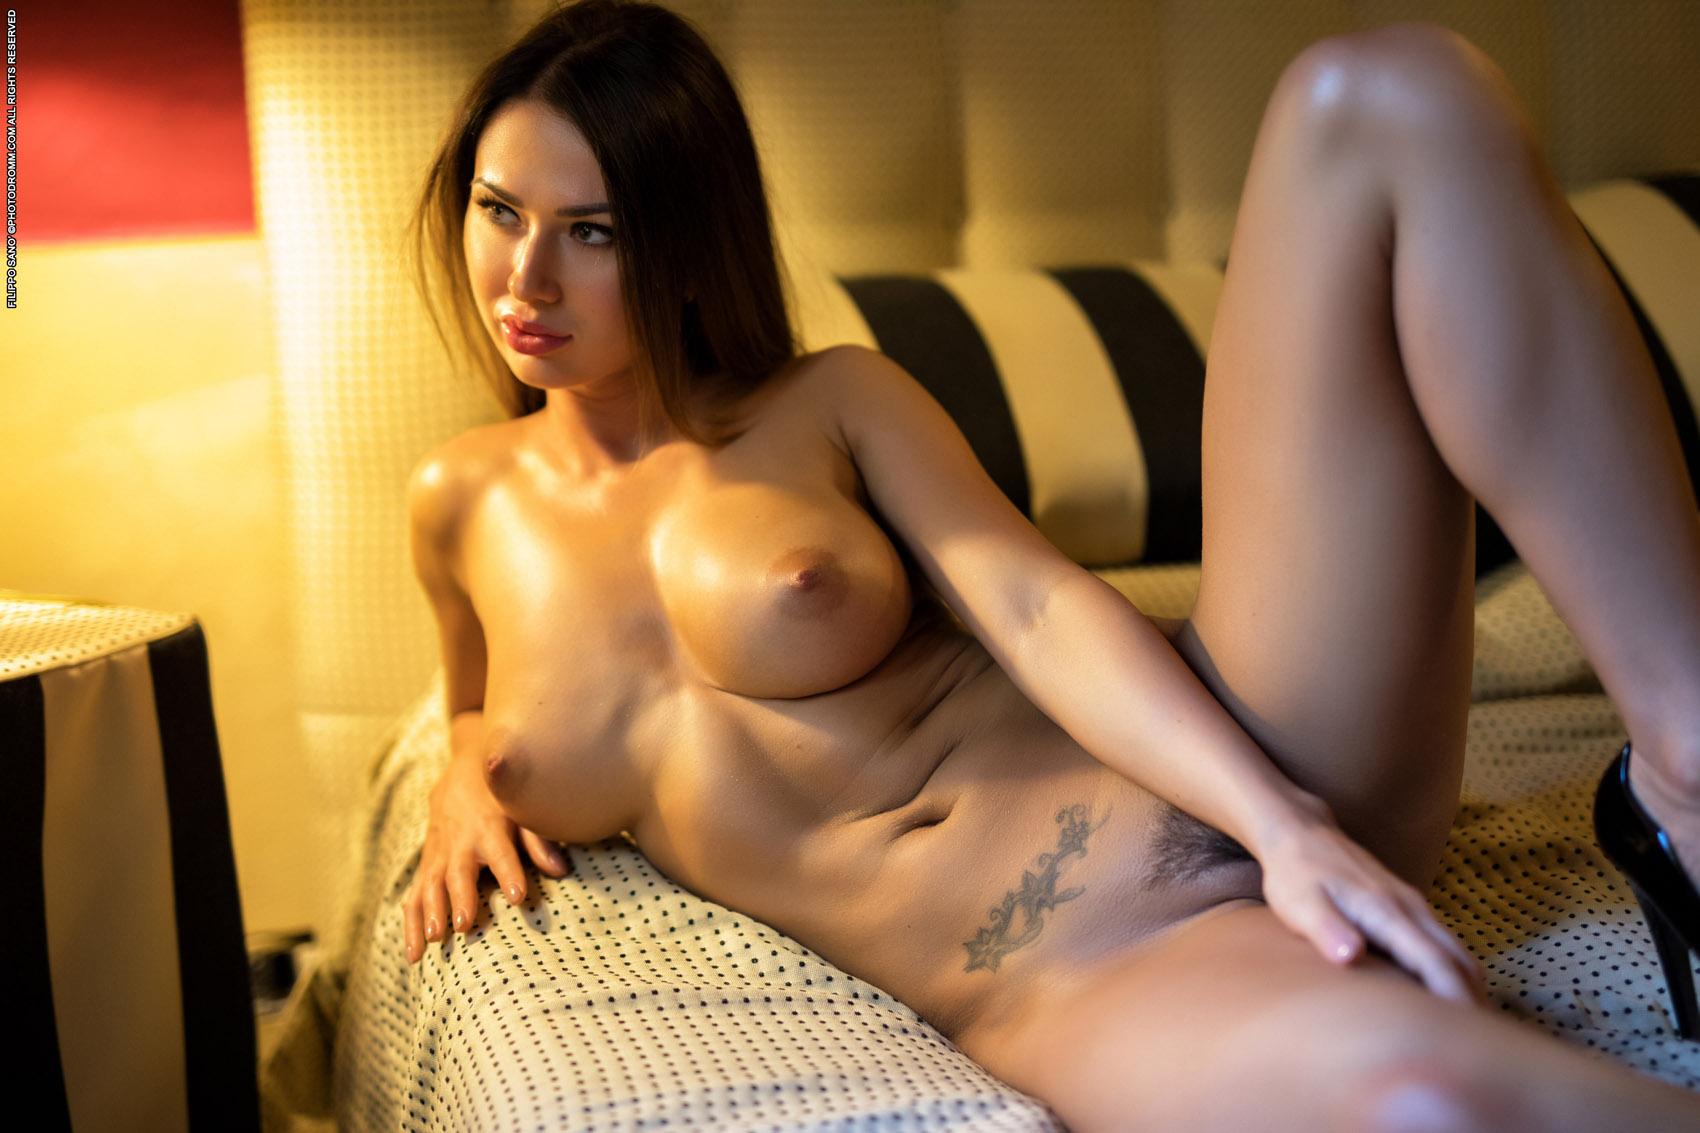 busty-shaved-brunette-goddess-justyna-with-big-naturals-wearing-fishnet-10.jpg